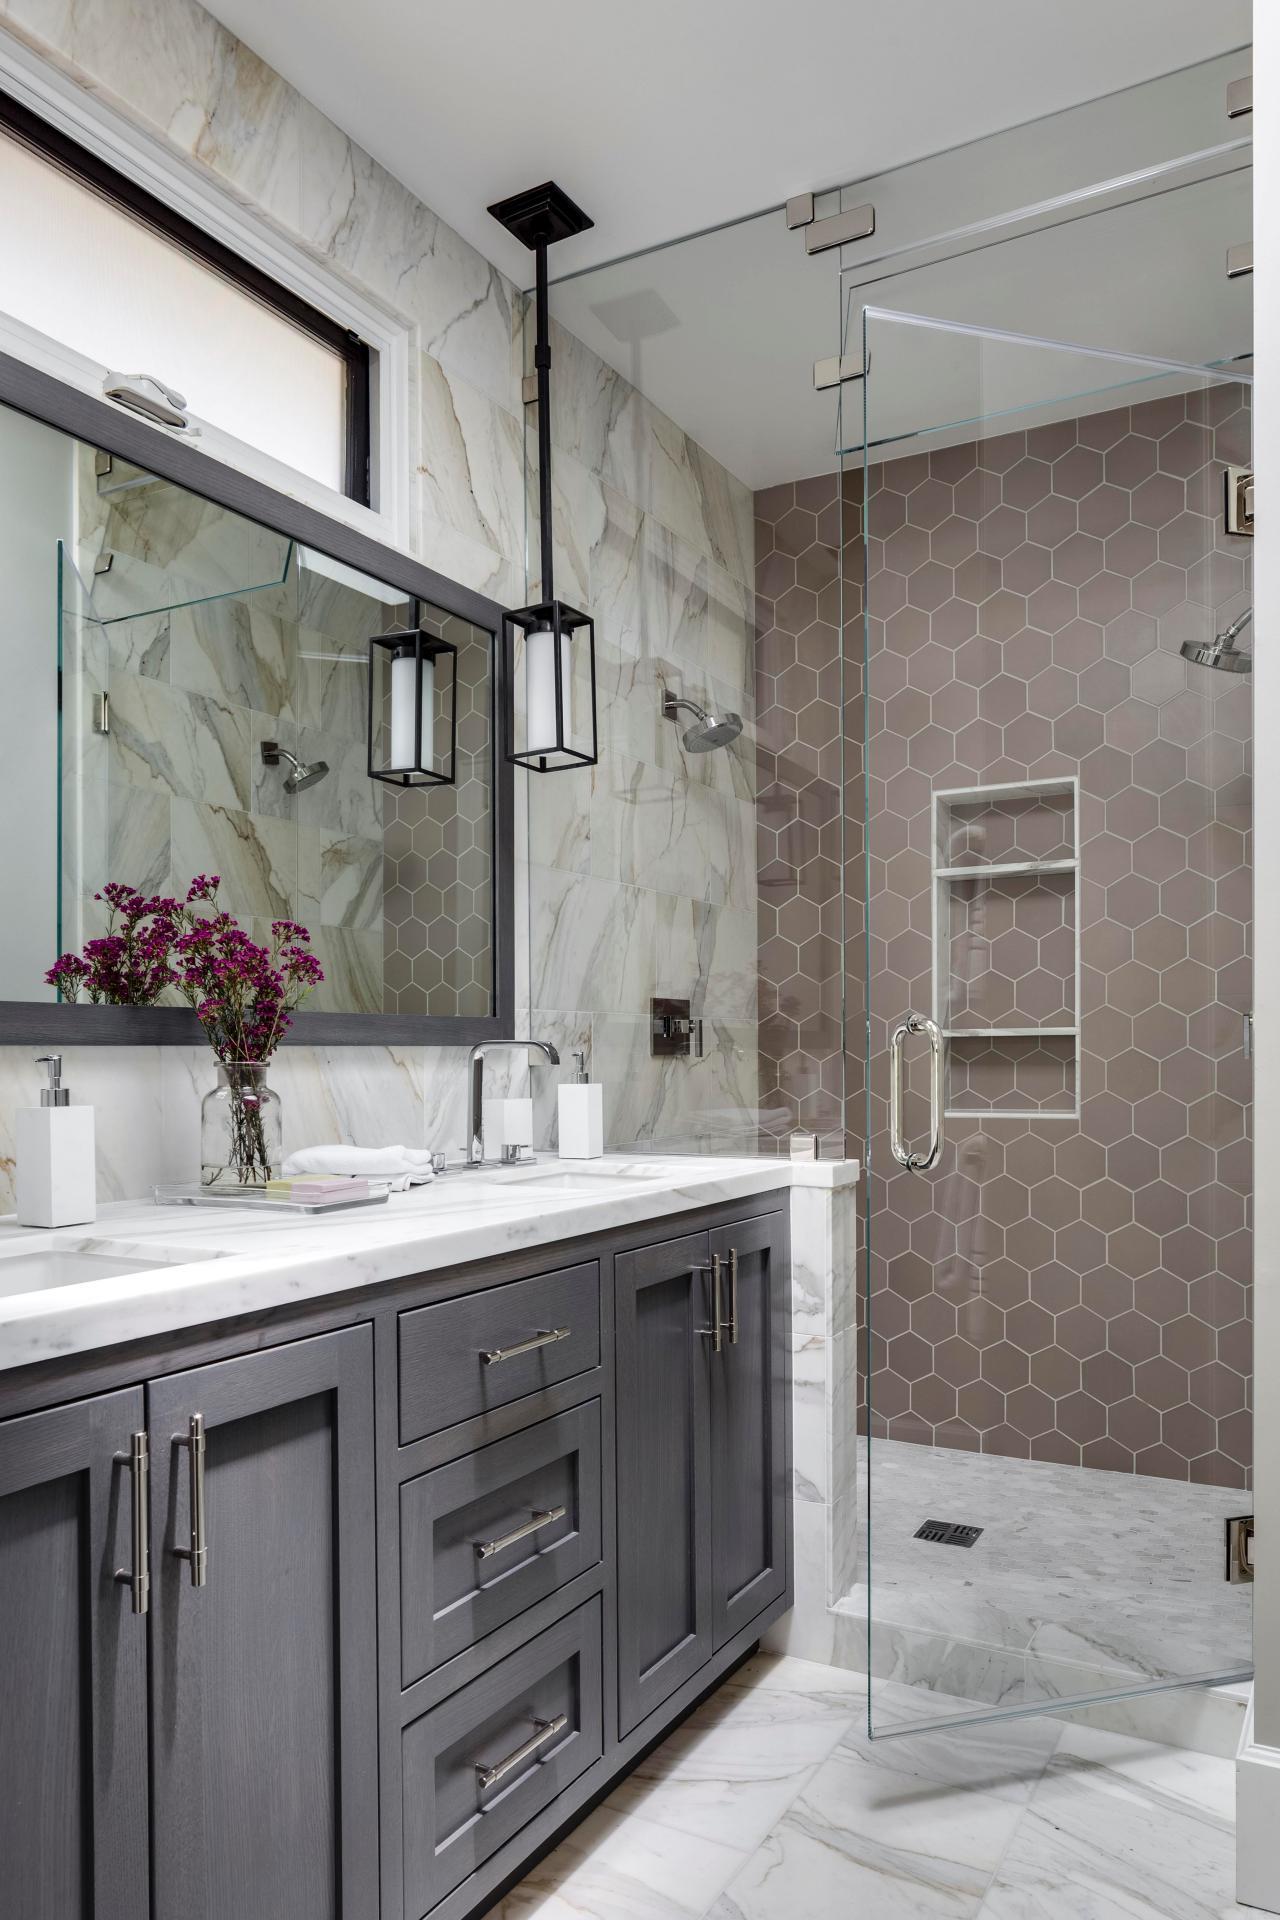 9 Bold Bathroom Tile Designs | HGTV's Decorating & Design ...